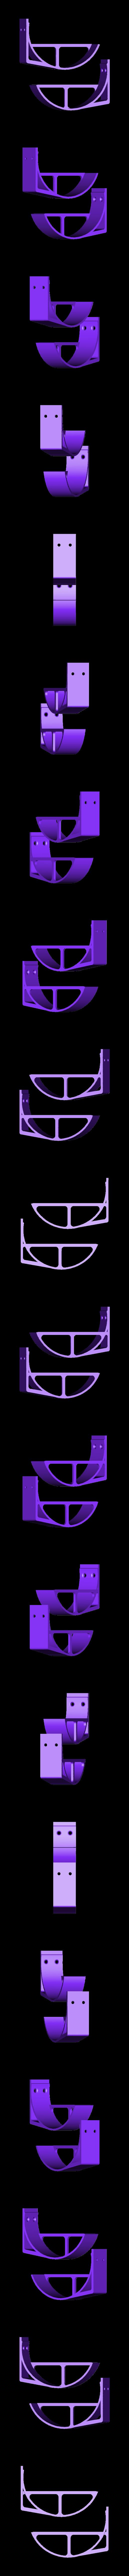 Rc Car wall mount d=100mm.stl Download free STL file Rc Car wall mount • 3D print template, DB46